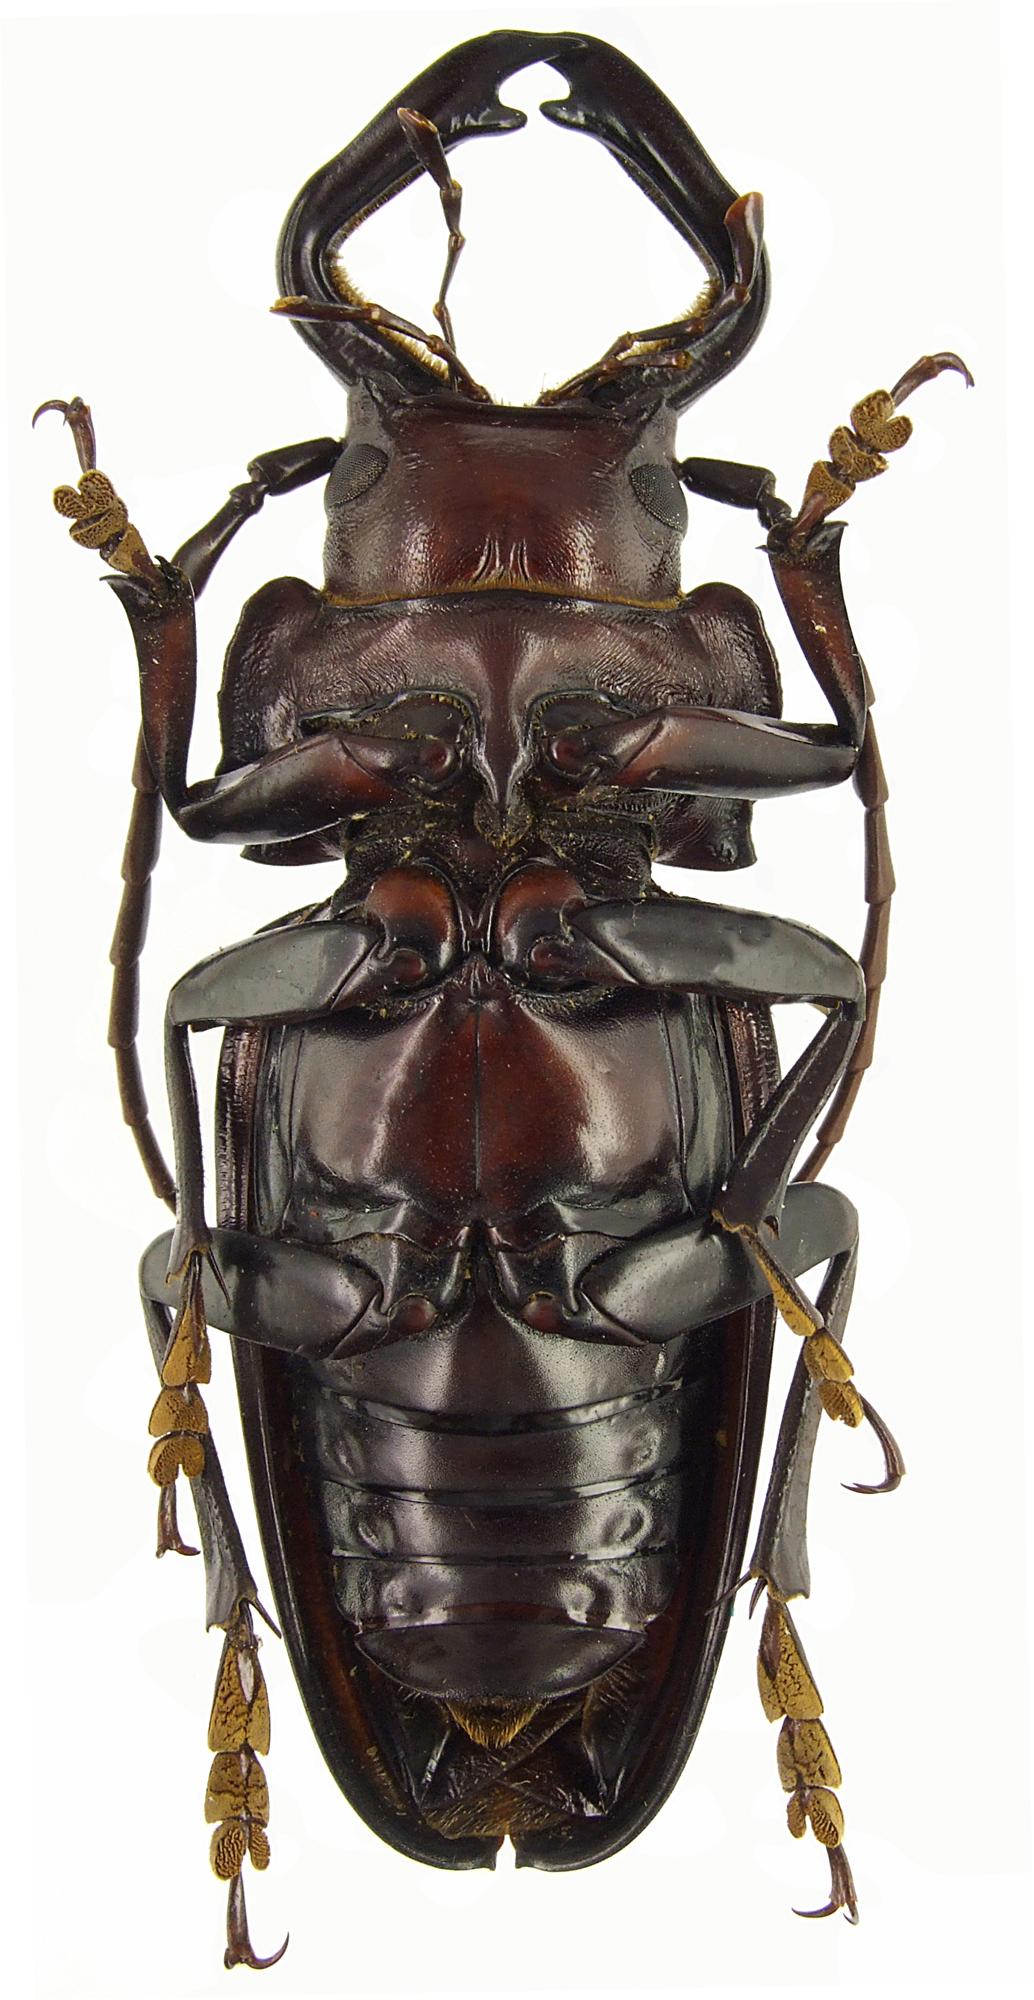 Notophysis forcipata 47300cz02.jpg